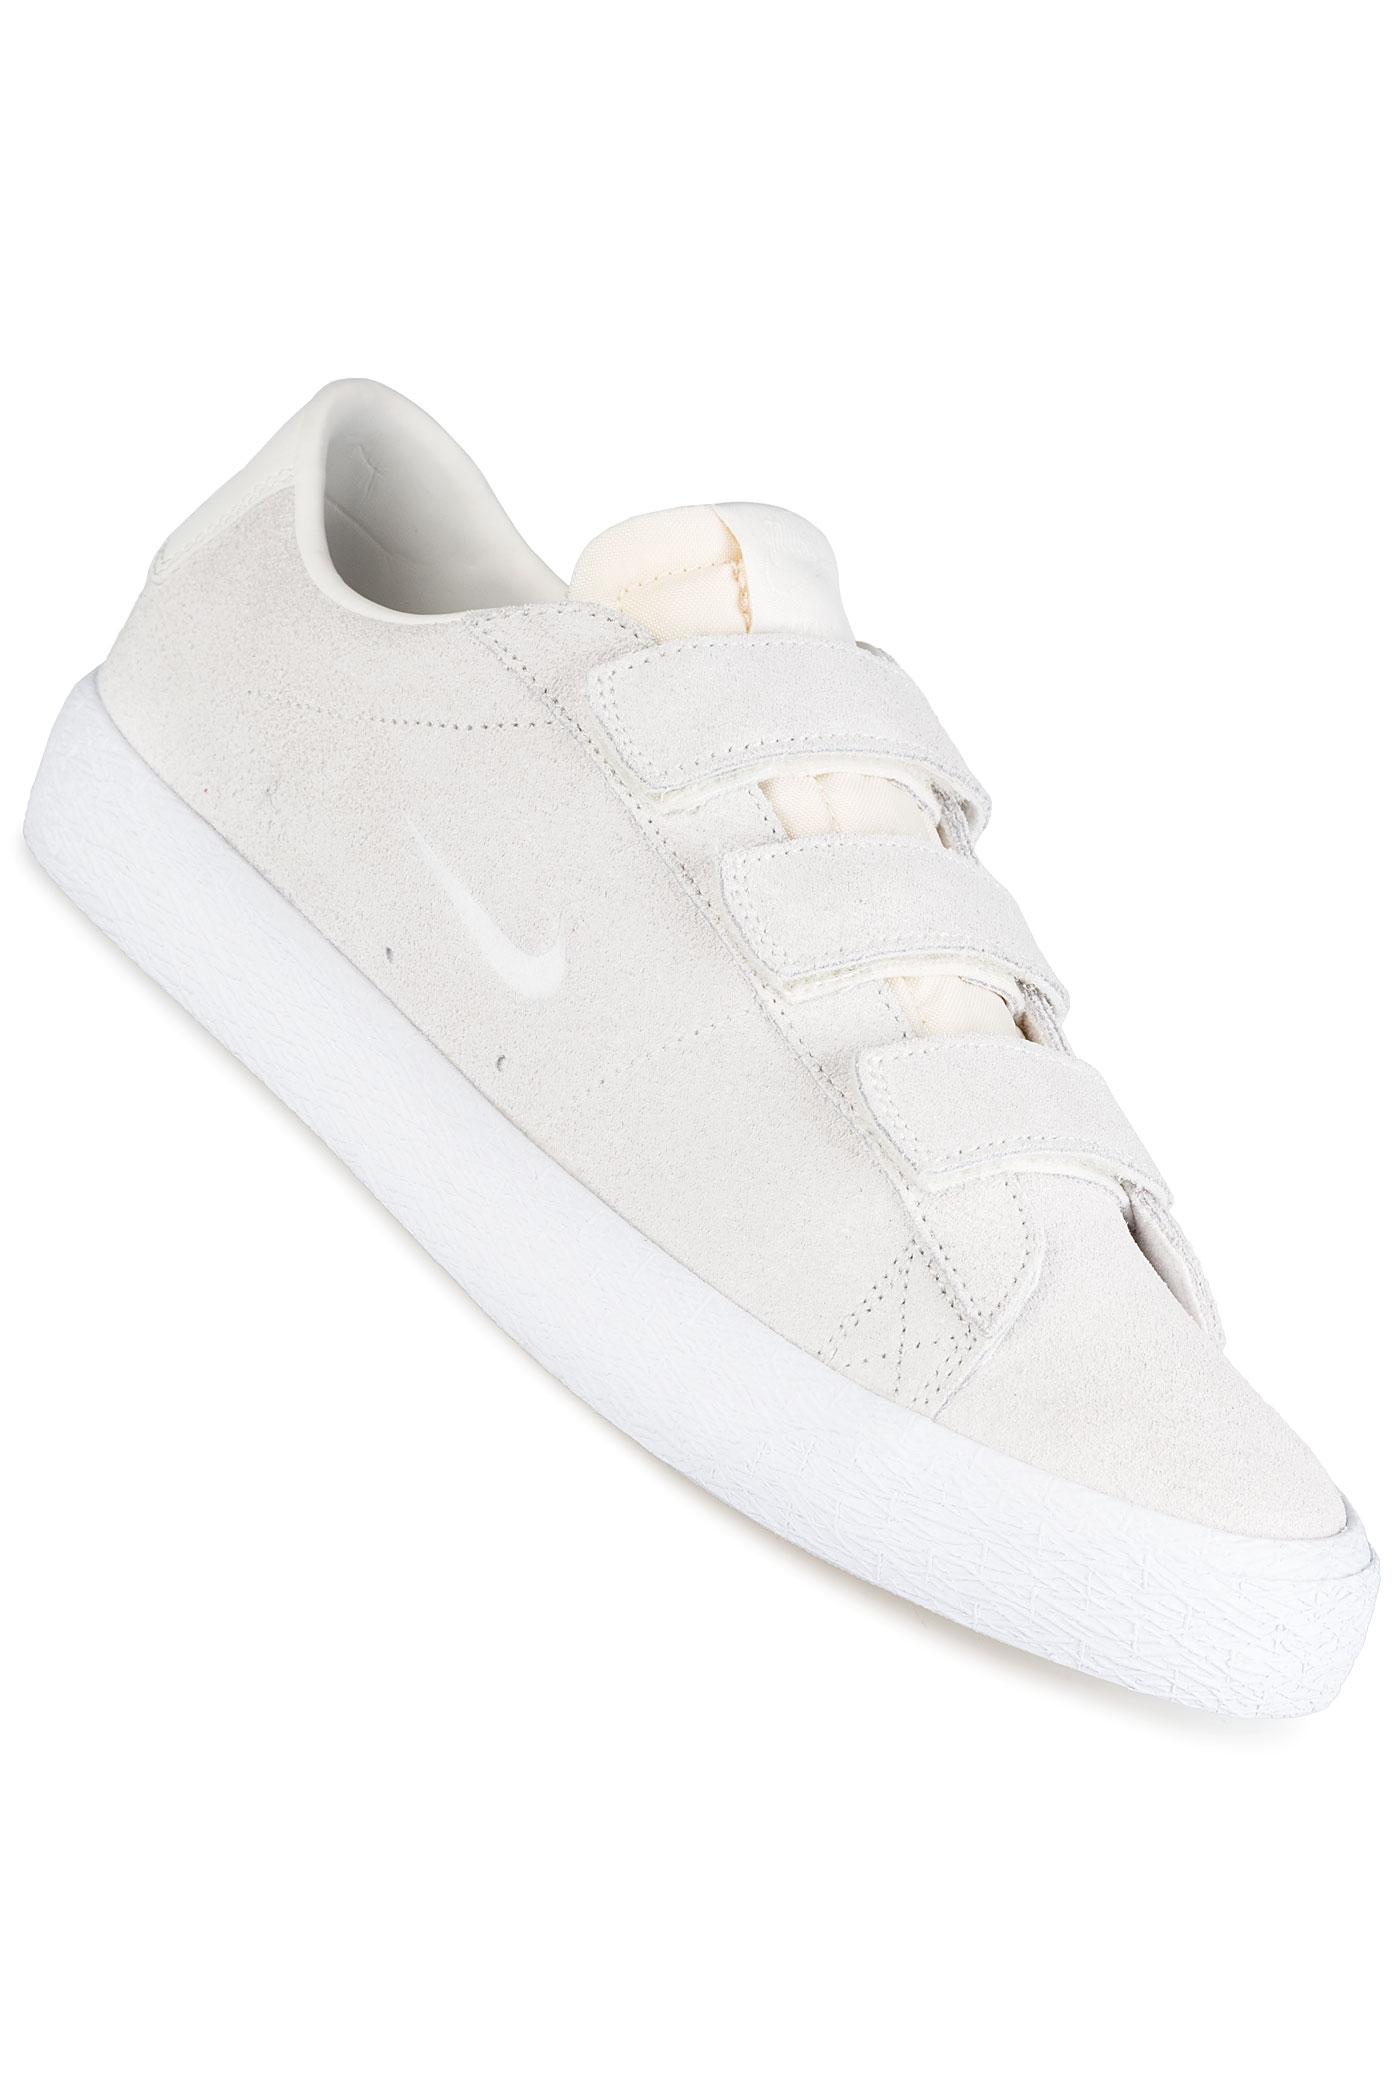 on sale d86c5 728c9 ... Nike SB x Numbers Zoom Blazer Low AC QS Shoes (sail white) ...